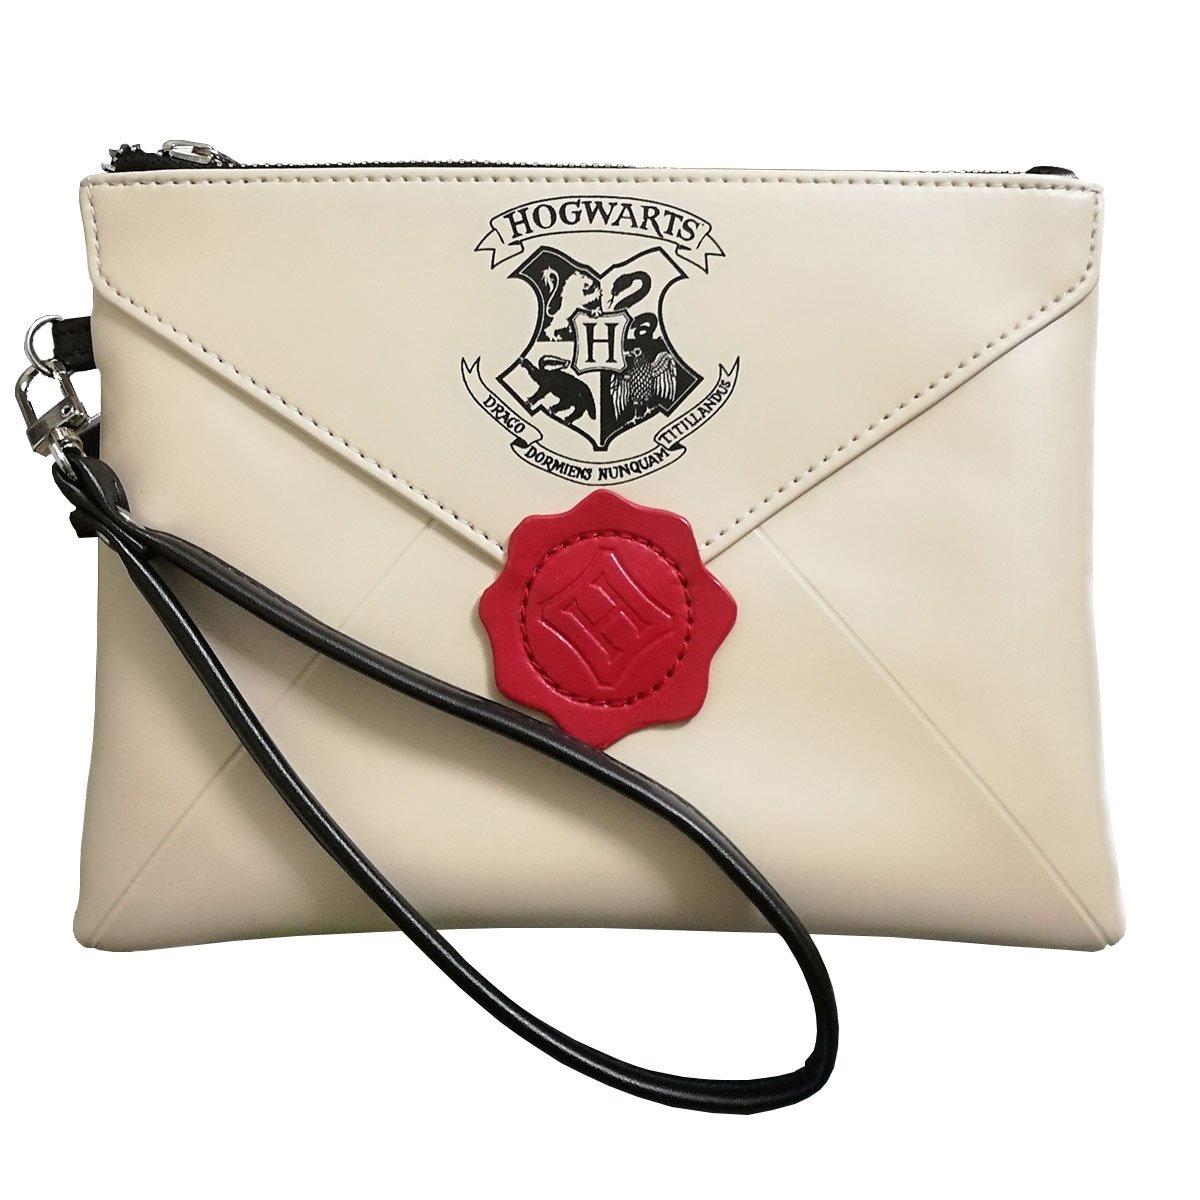 Woman Handbags Harry Potter Letter From Hogwarts Wallet Cosmetic Bag by Tvoj Poklon